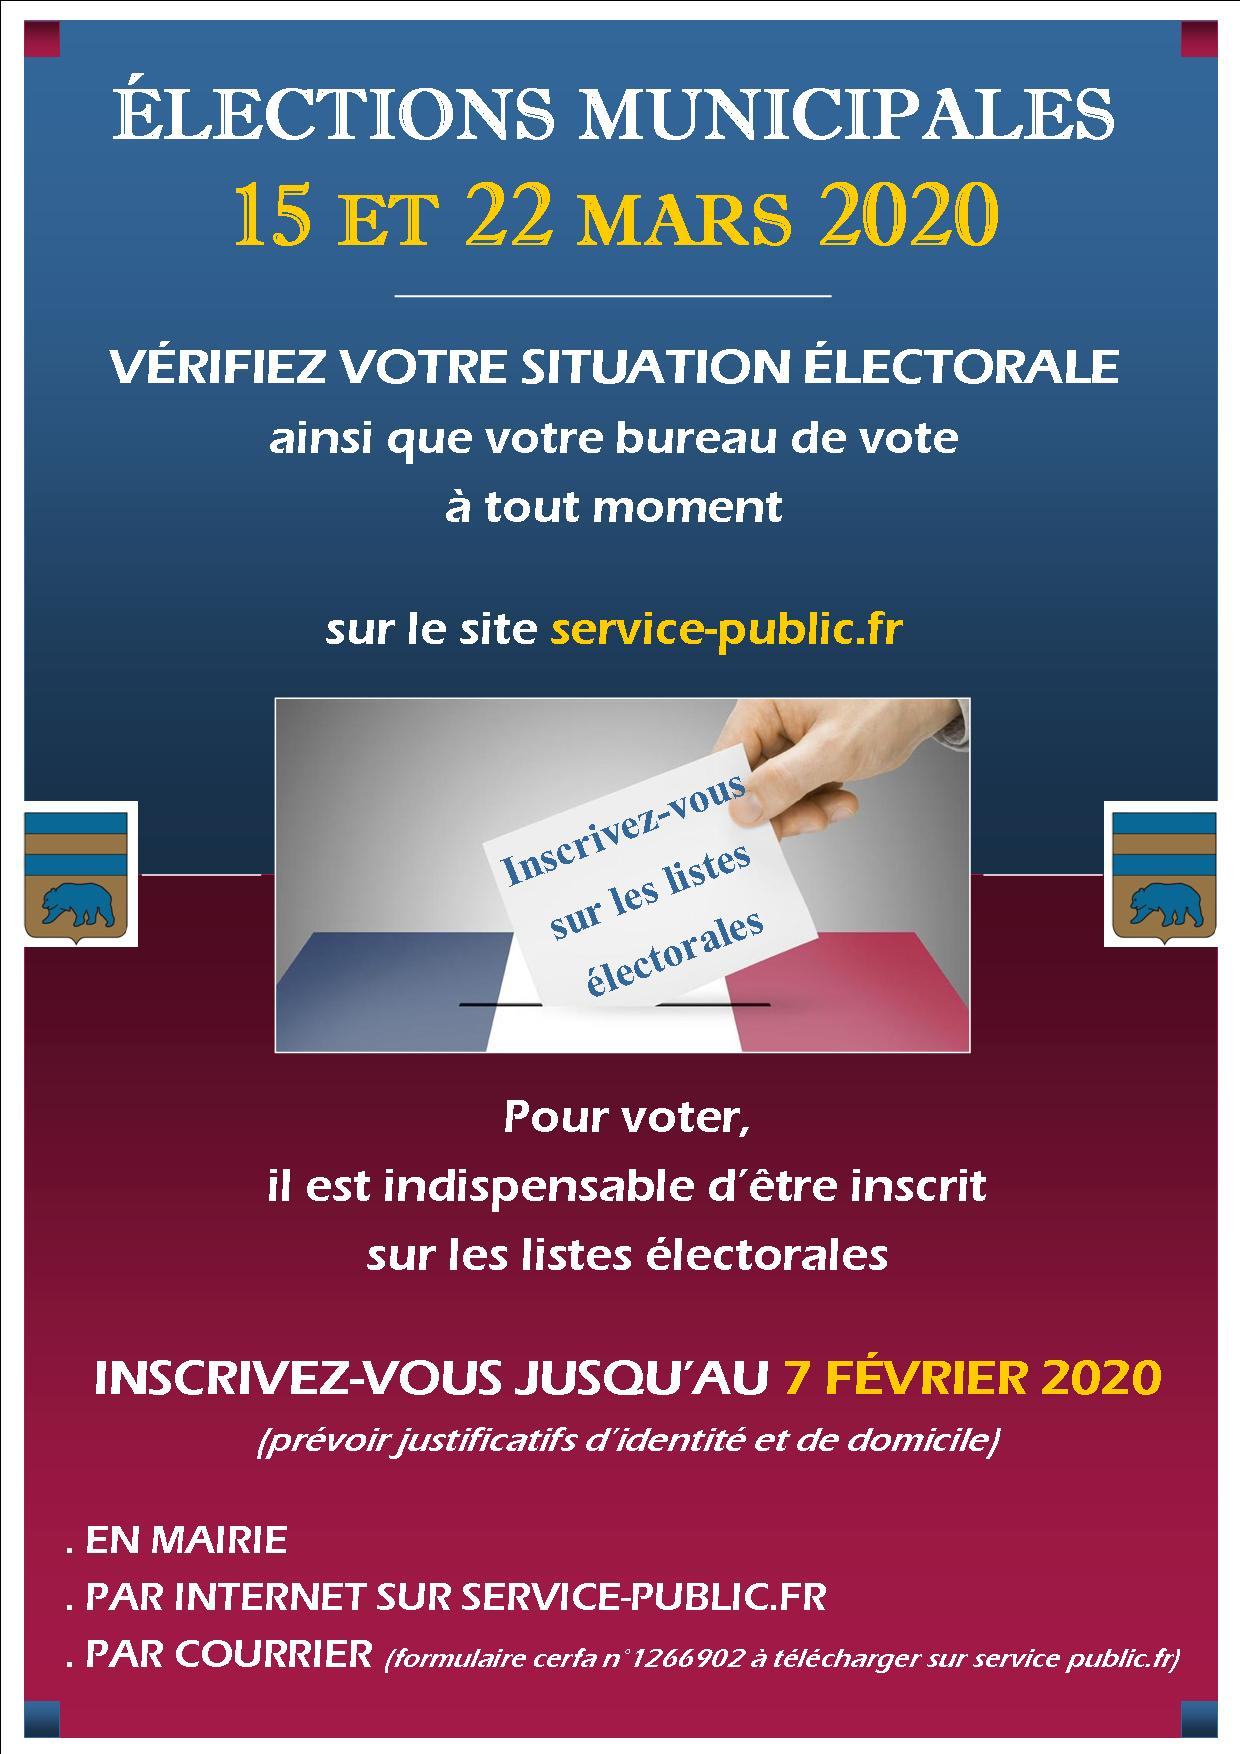 affiche elections